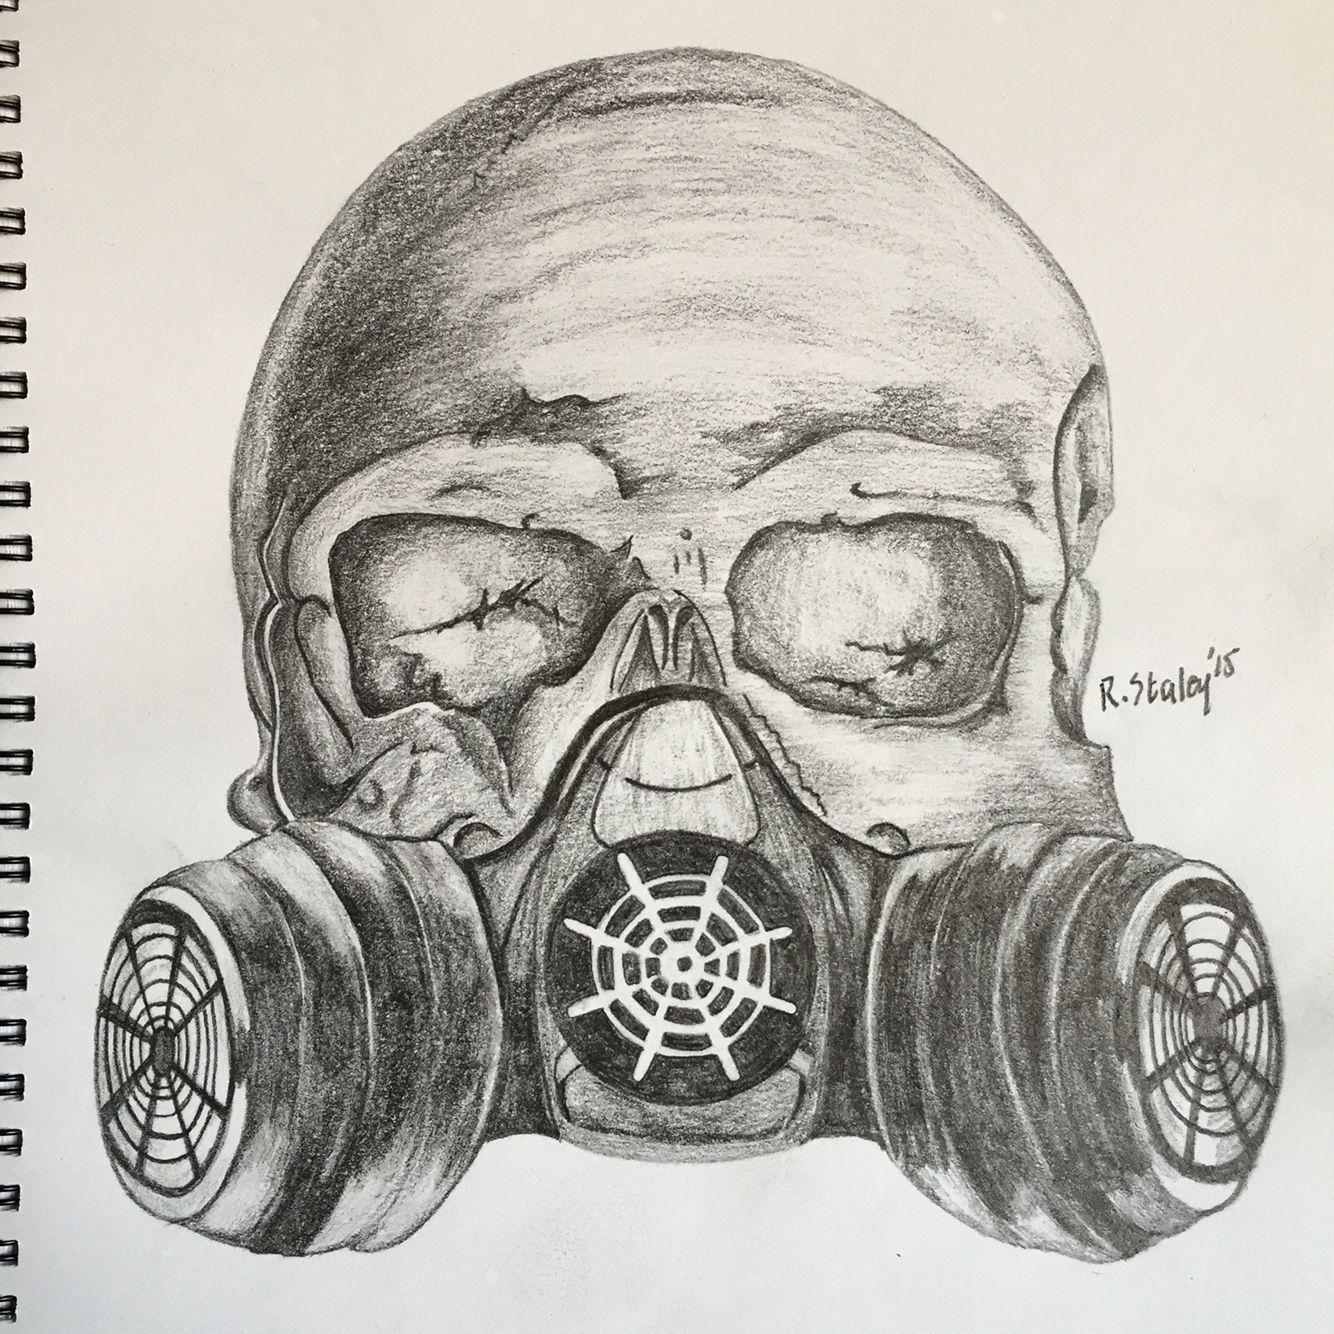 ww2 gas mask on skull artcrafts in 2019 gas mask